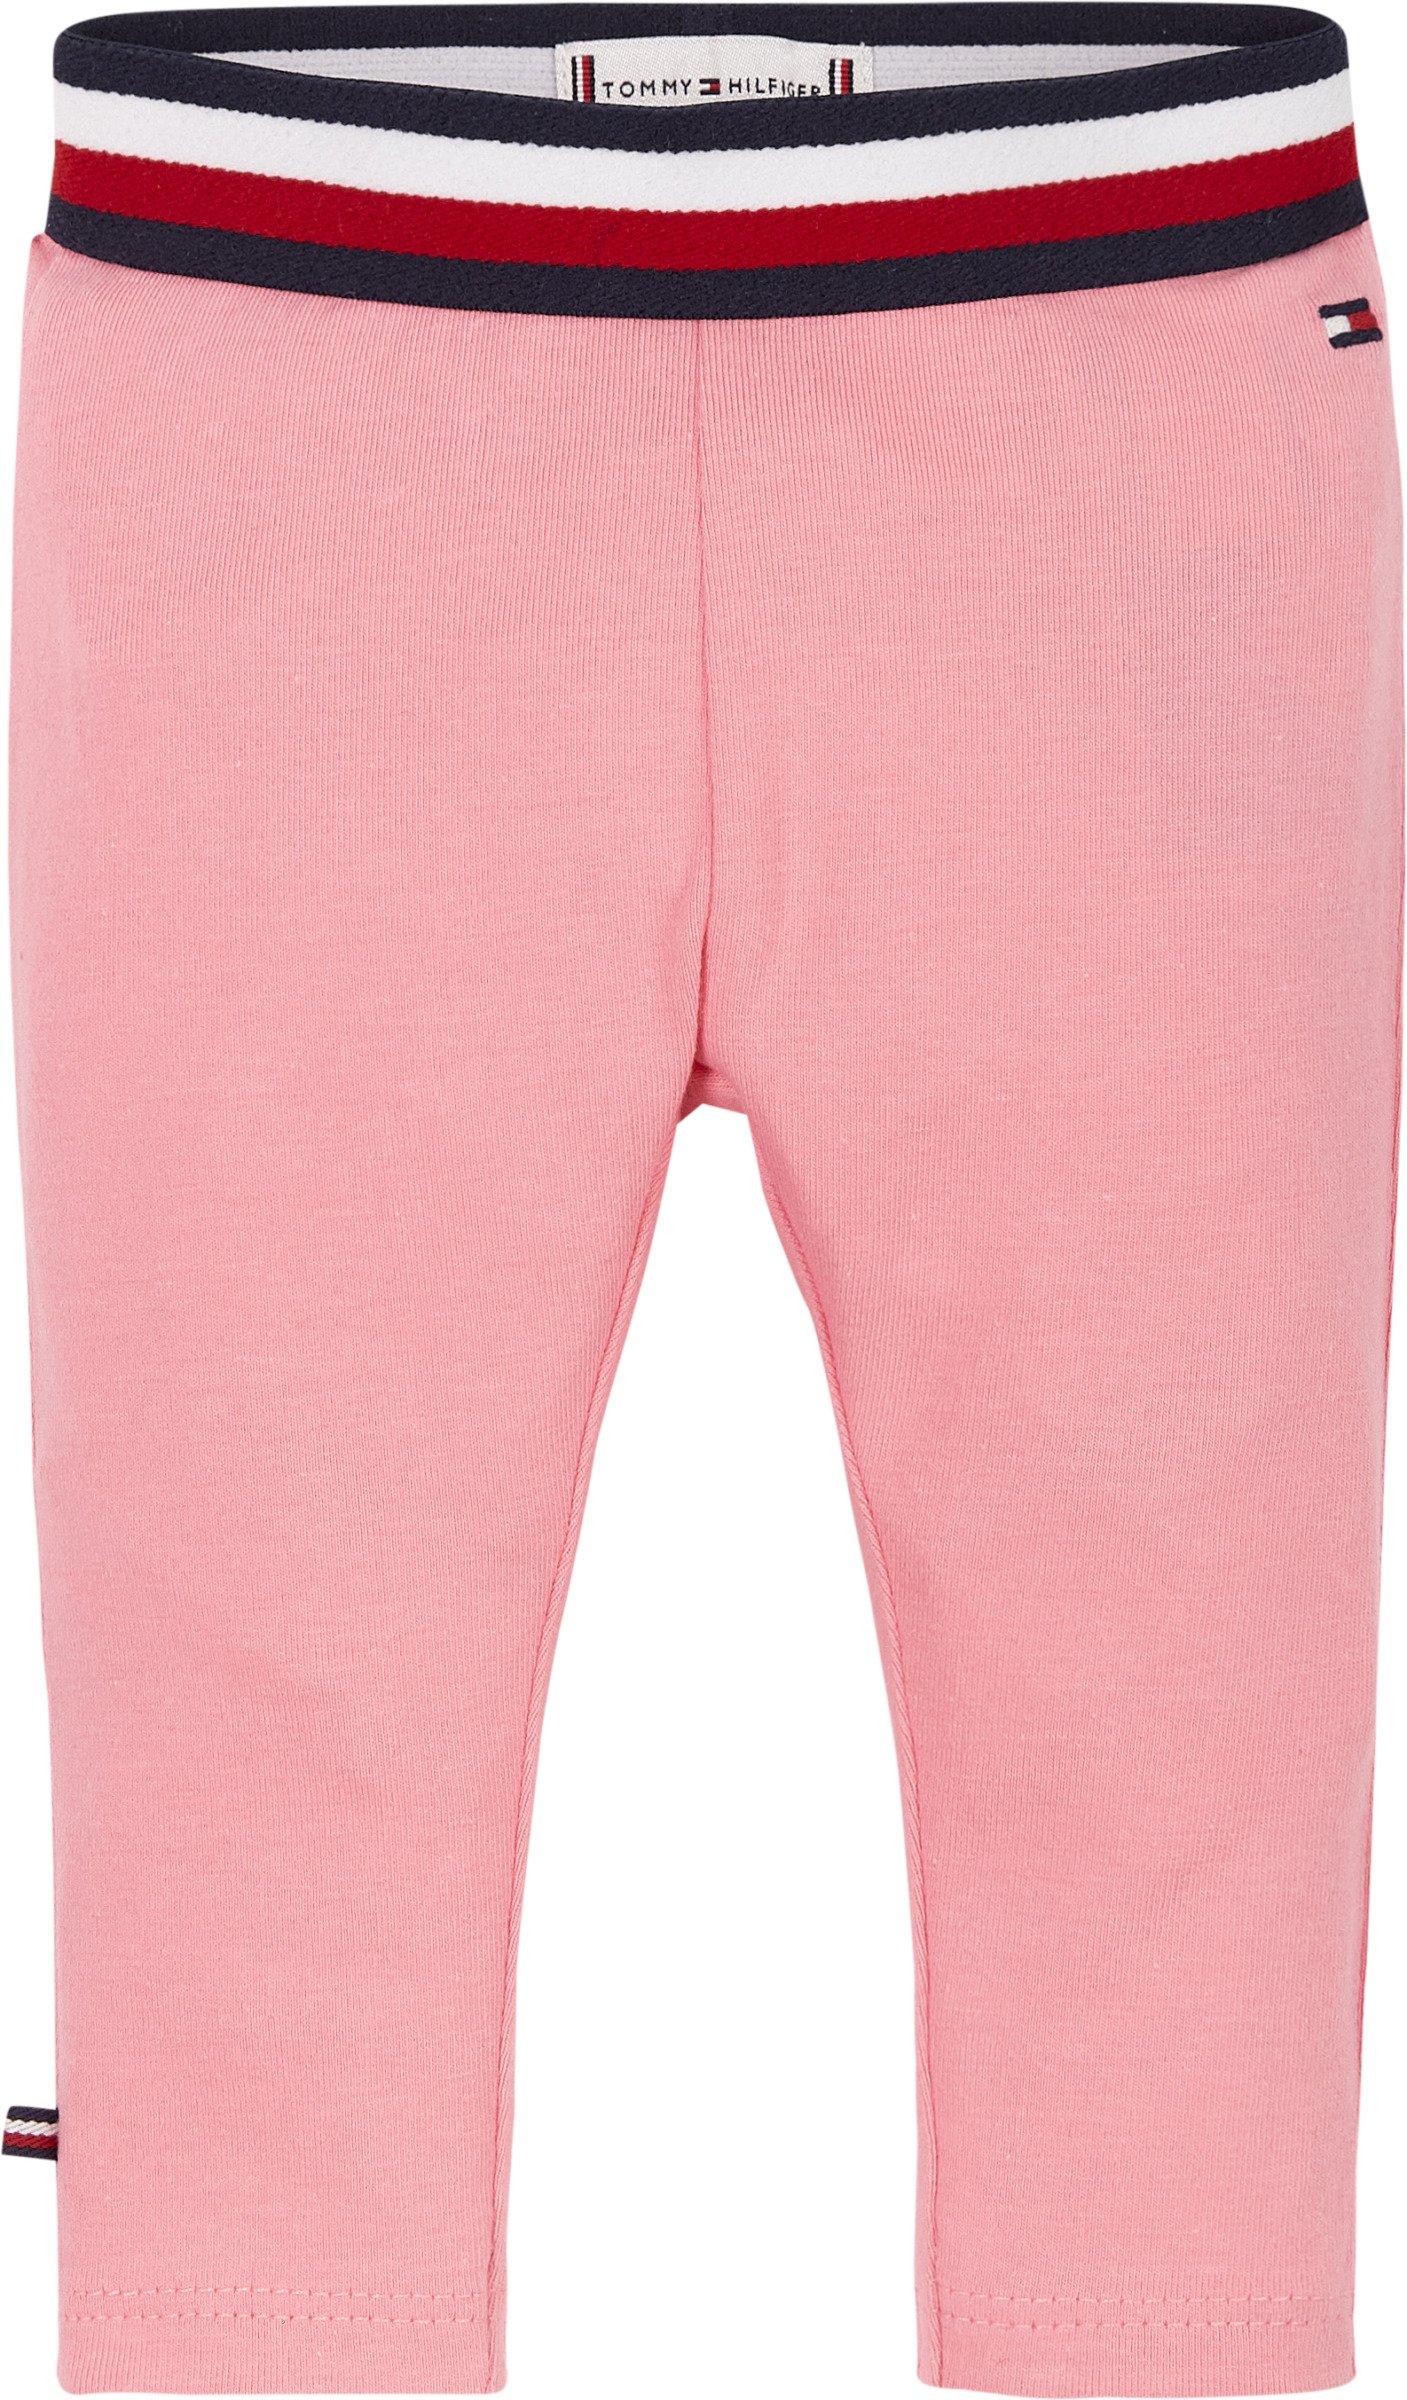 Tommy Hilfiger, Baby solid leggings pinkki